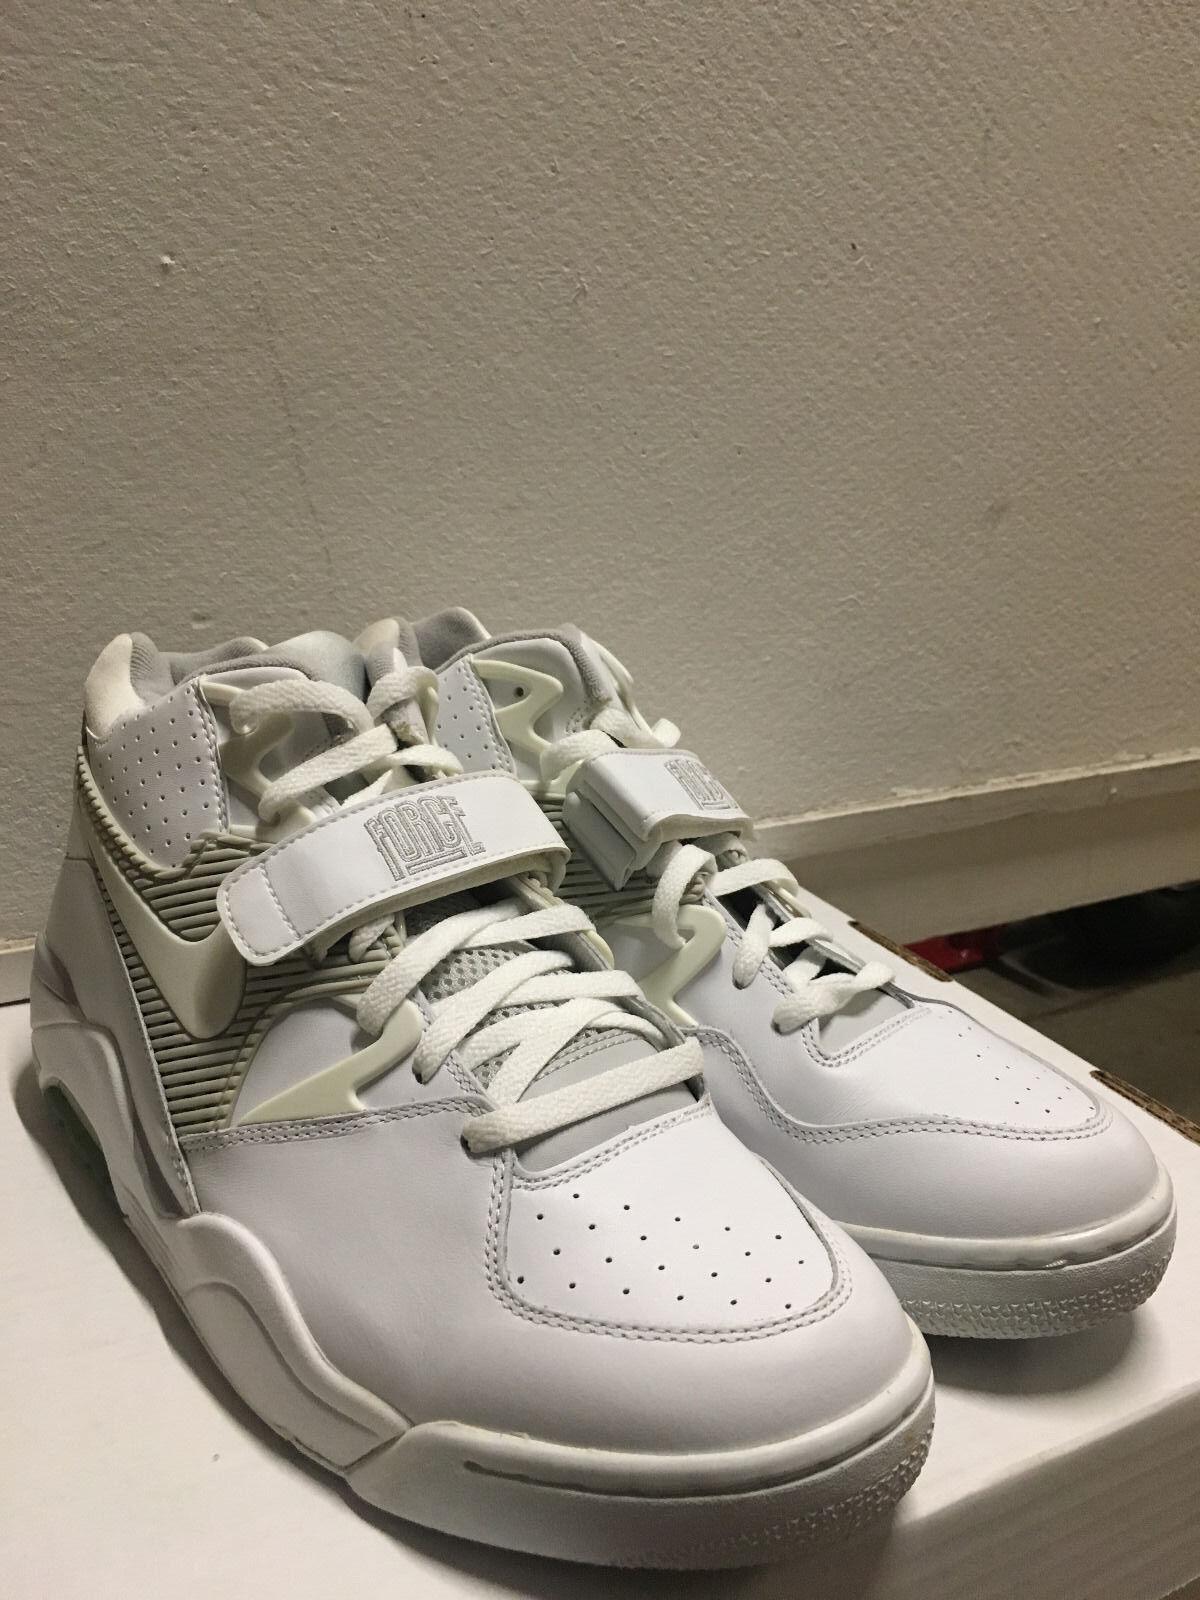 Nike air force 180 barkley taglia 12 pennino